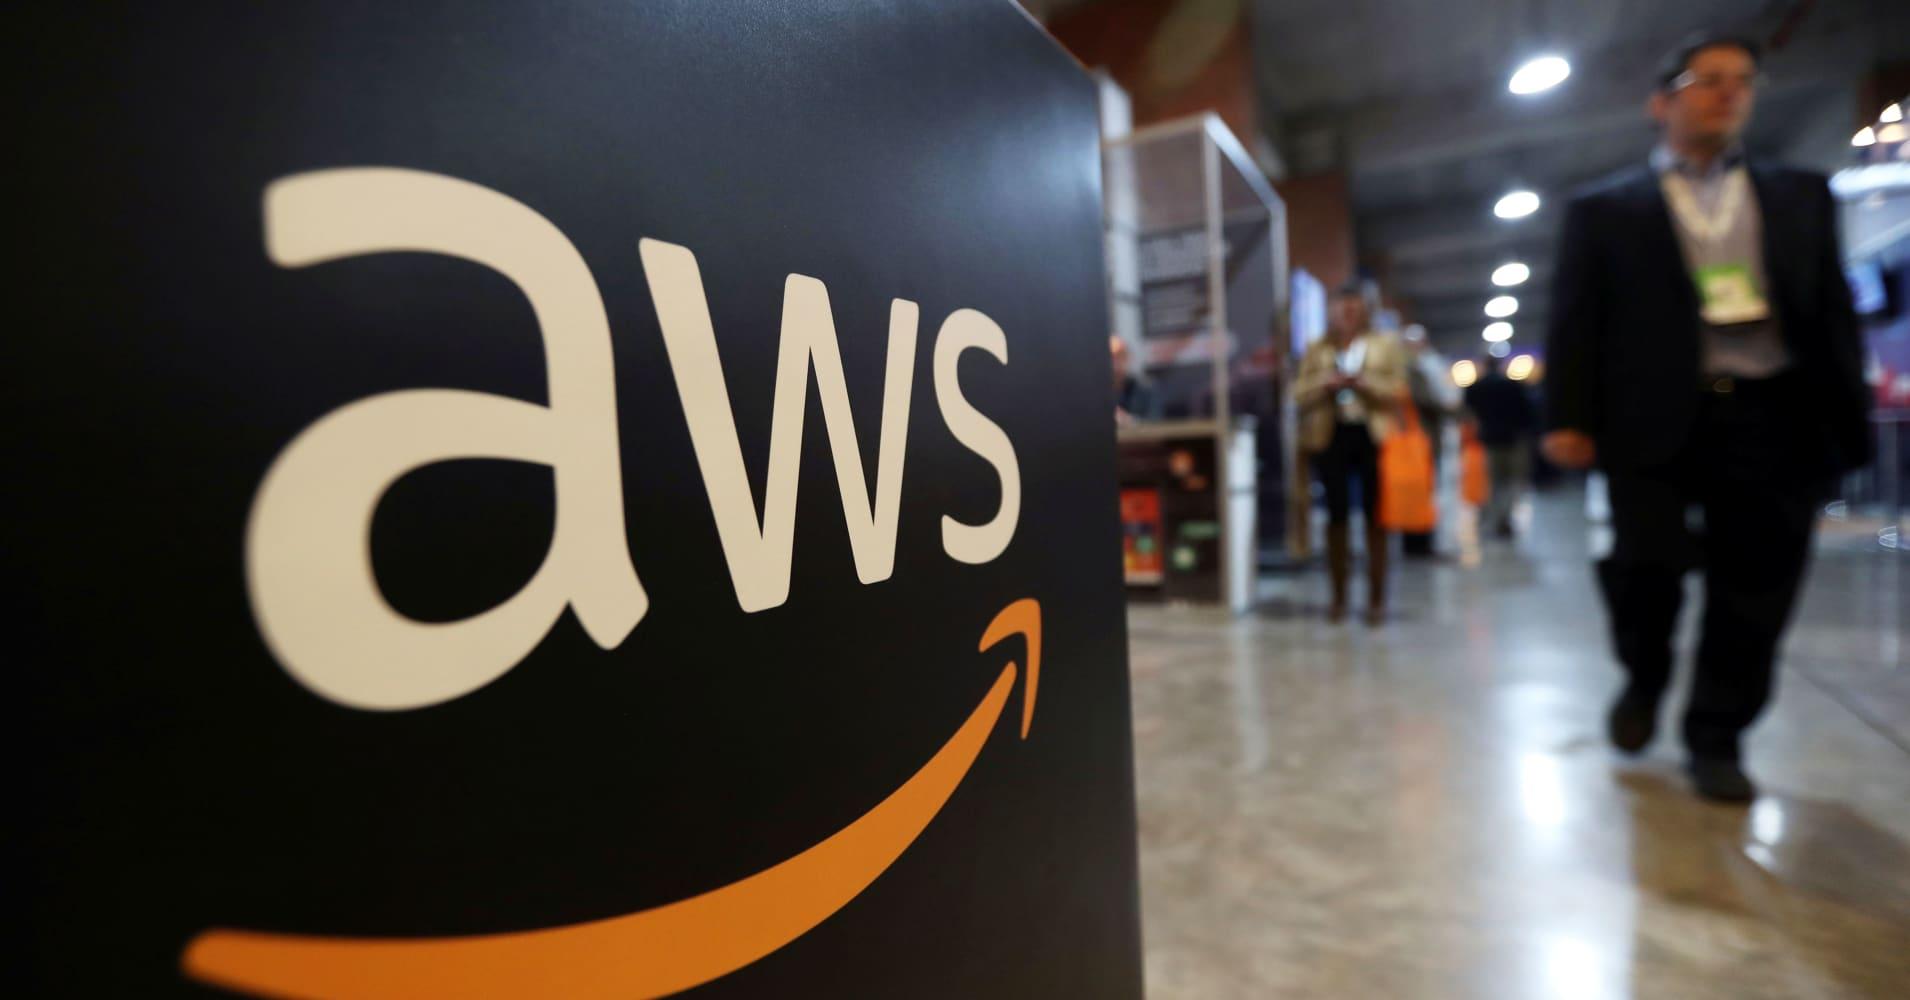 Amazon should split into two companies to avoid antitrust scrutiny from Trump administration: Citi